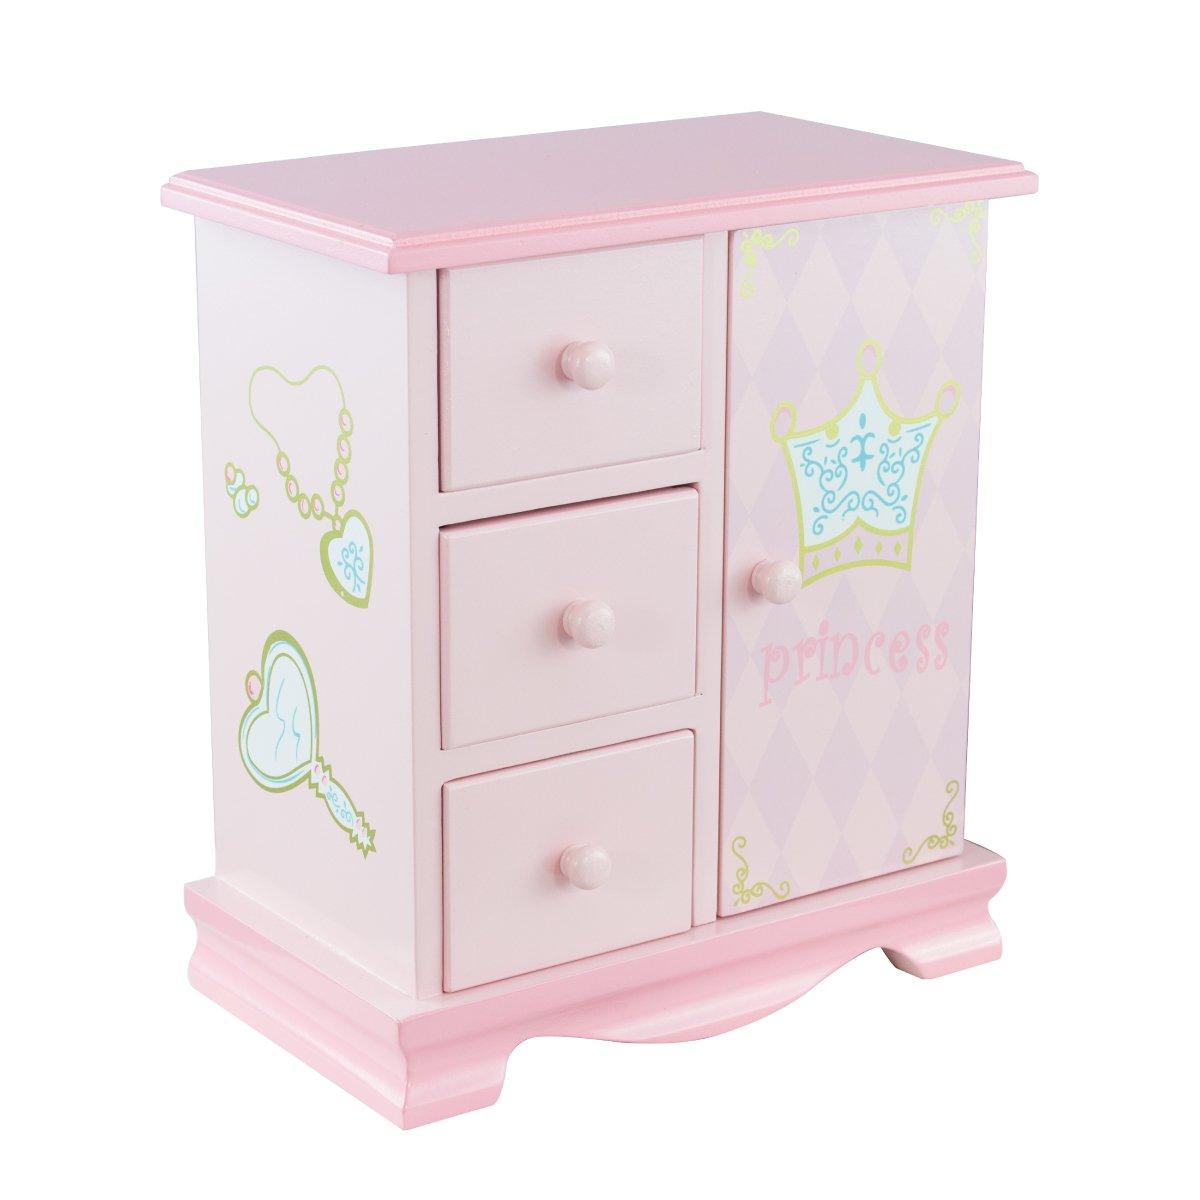 Teamson Kids Princess 3 Drawer/1 Door Jewelry Music Box Toy, Pink